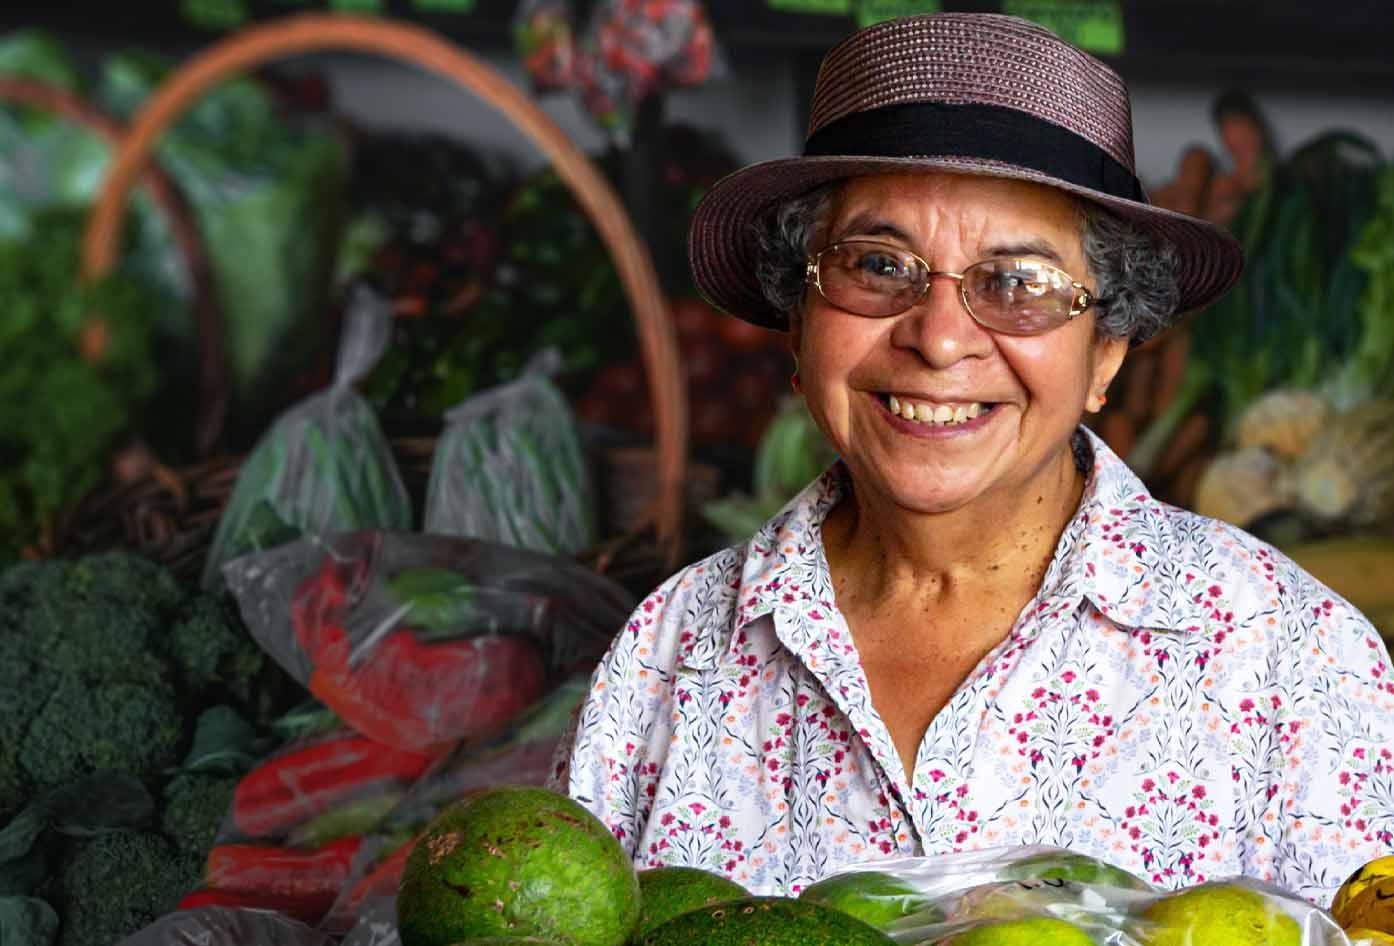 panama food vendor